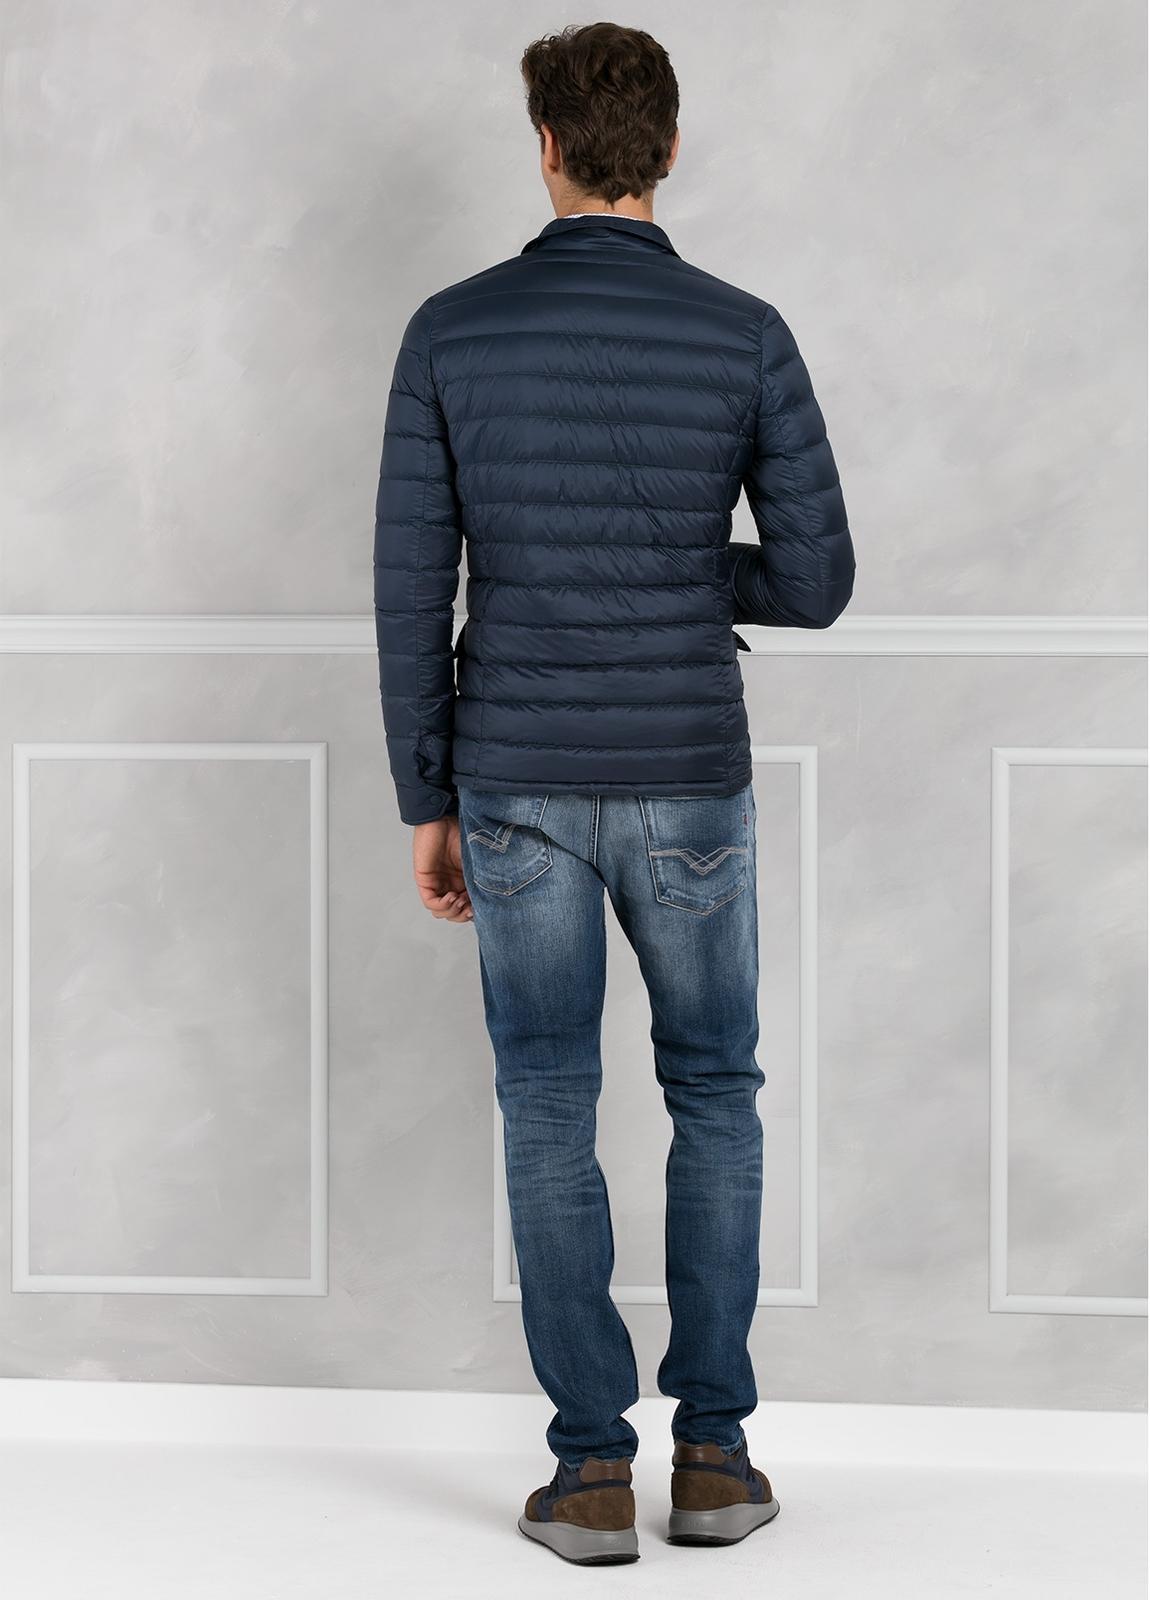 Chaqueta modelo BEEMIN color azul marino, tejido técnico. - Ítem1